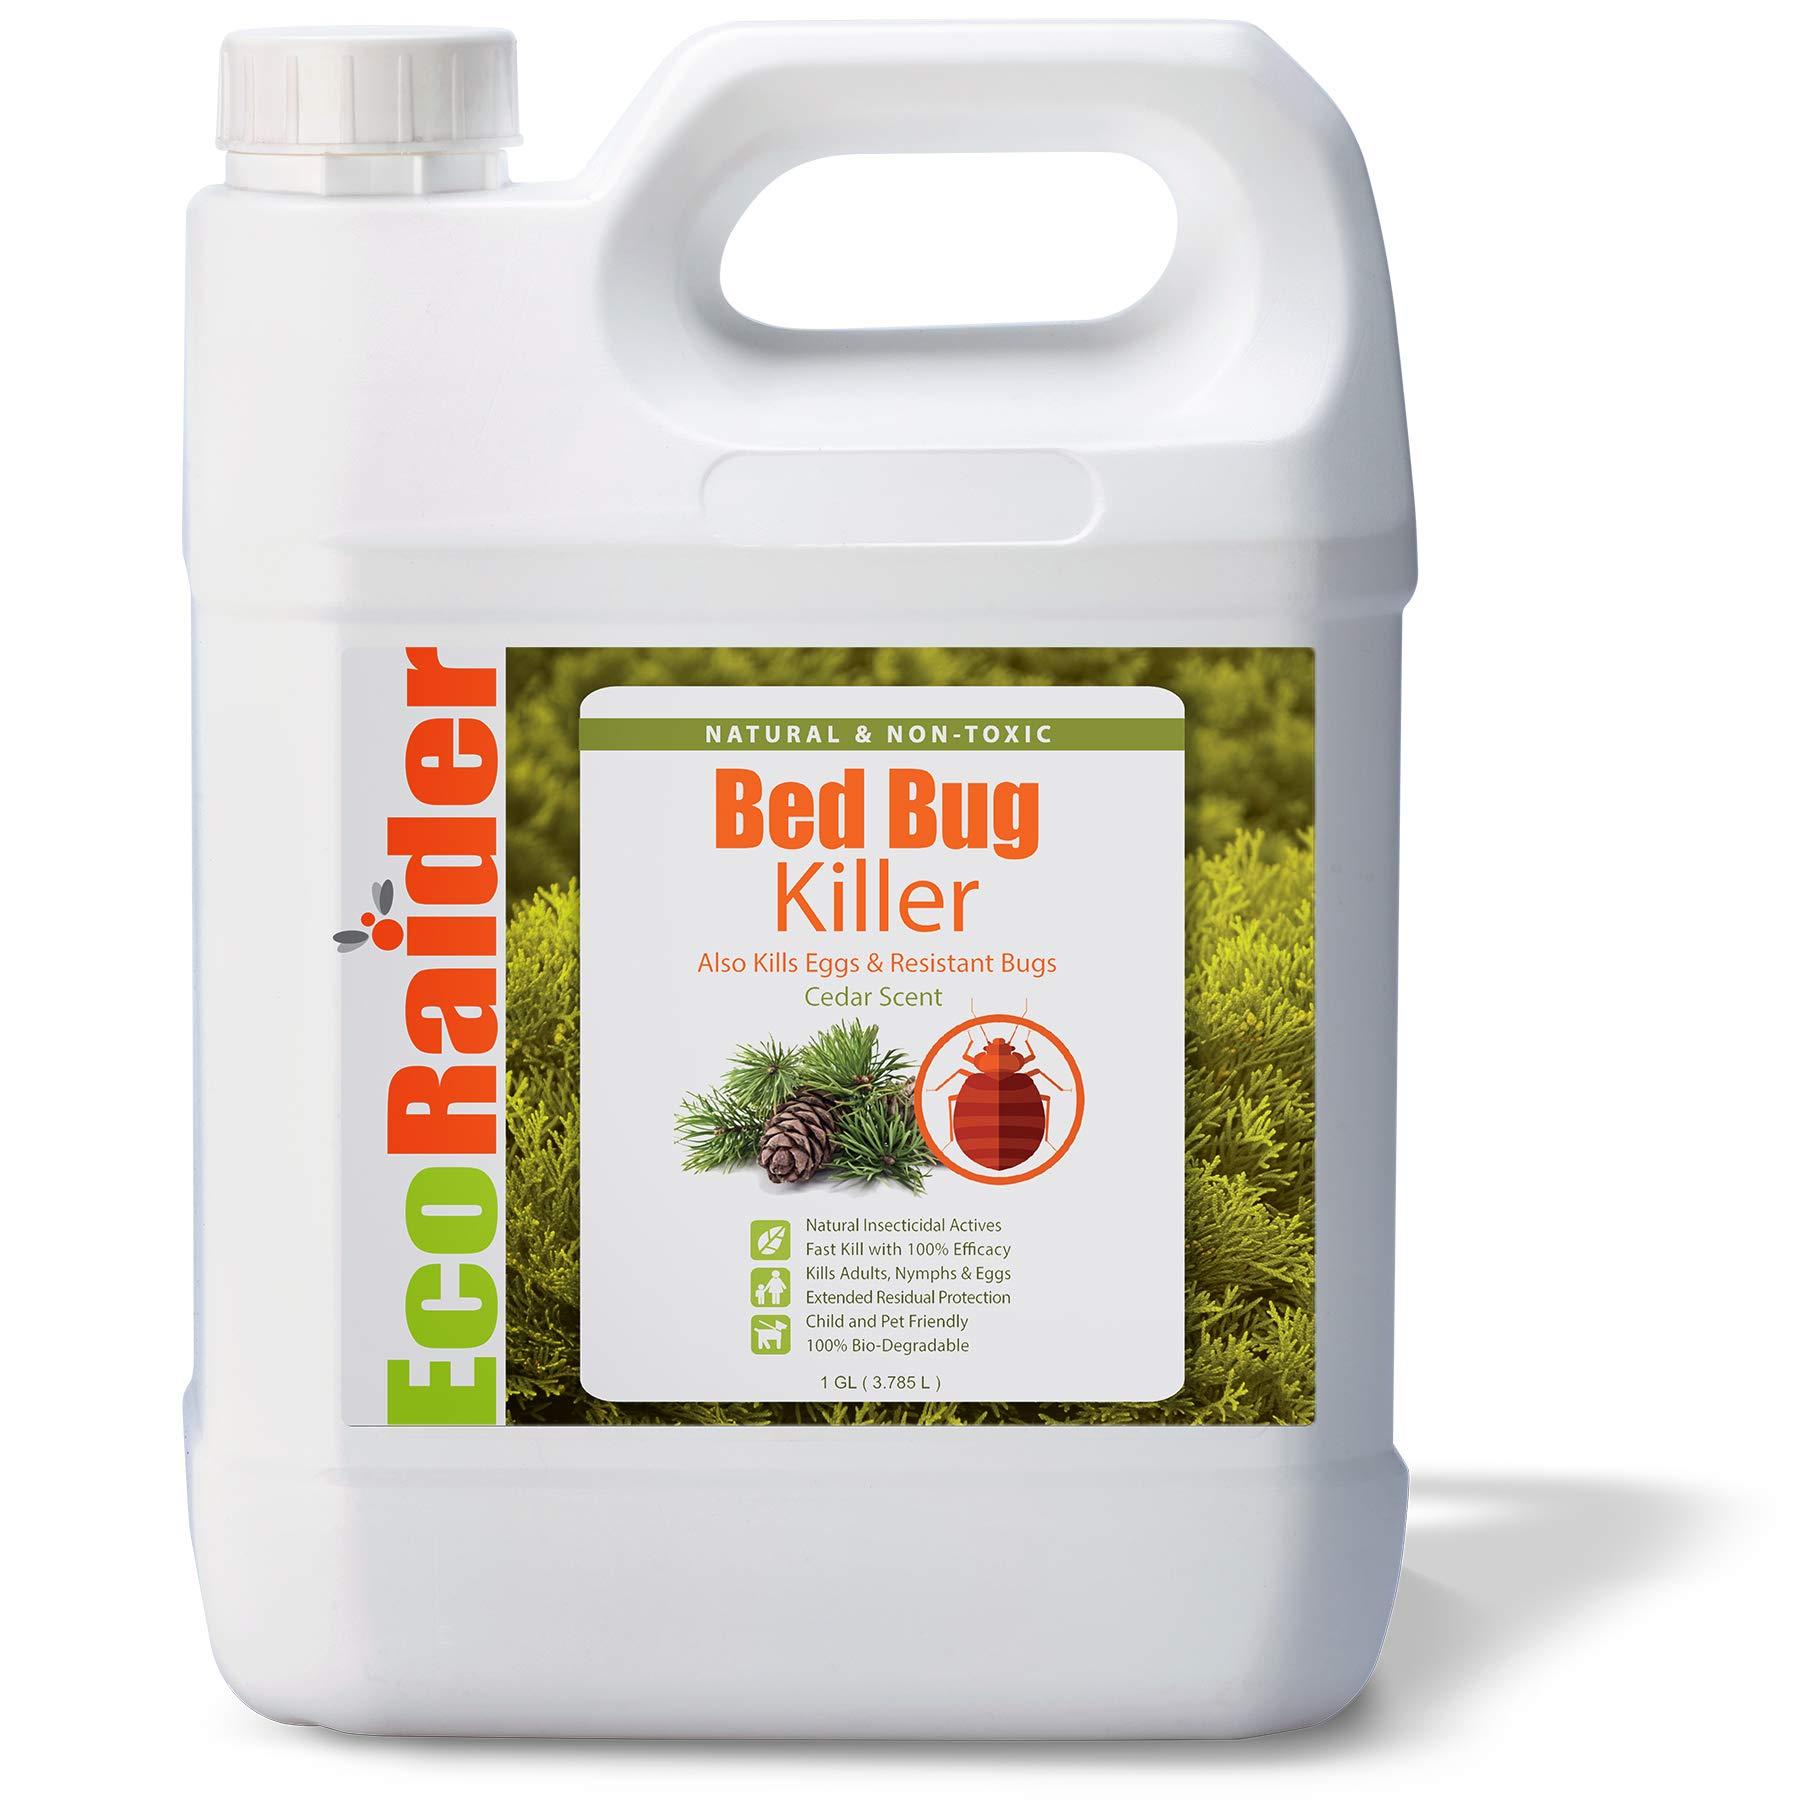 EcoRaider Bed Bug Killer Spray, Green + Non-Toxic, 100% Kill + Extended Protection (1 Gallon) by EcoRaider